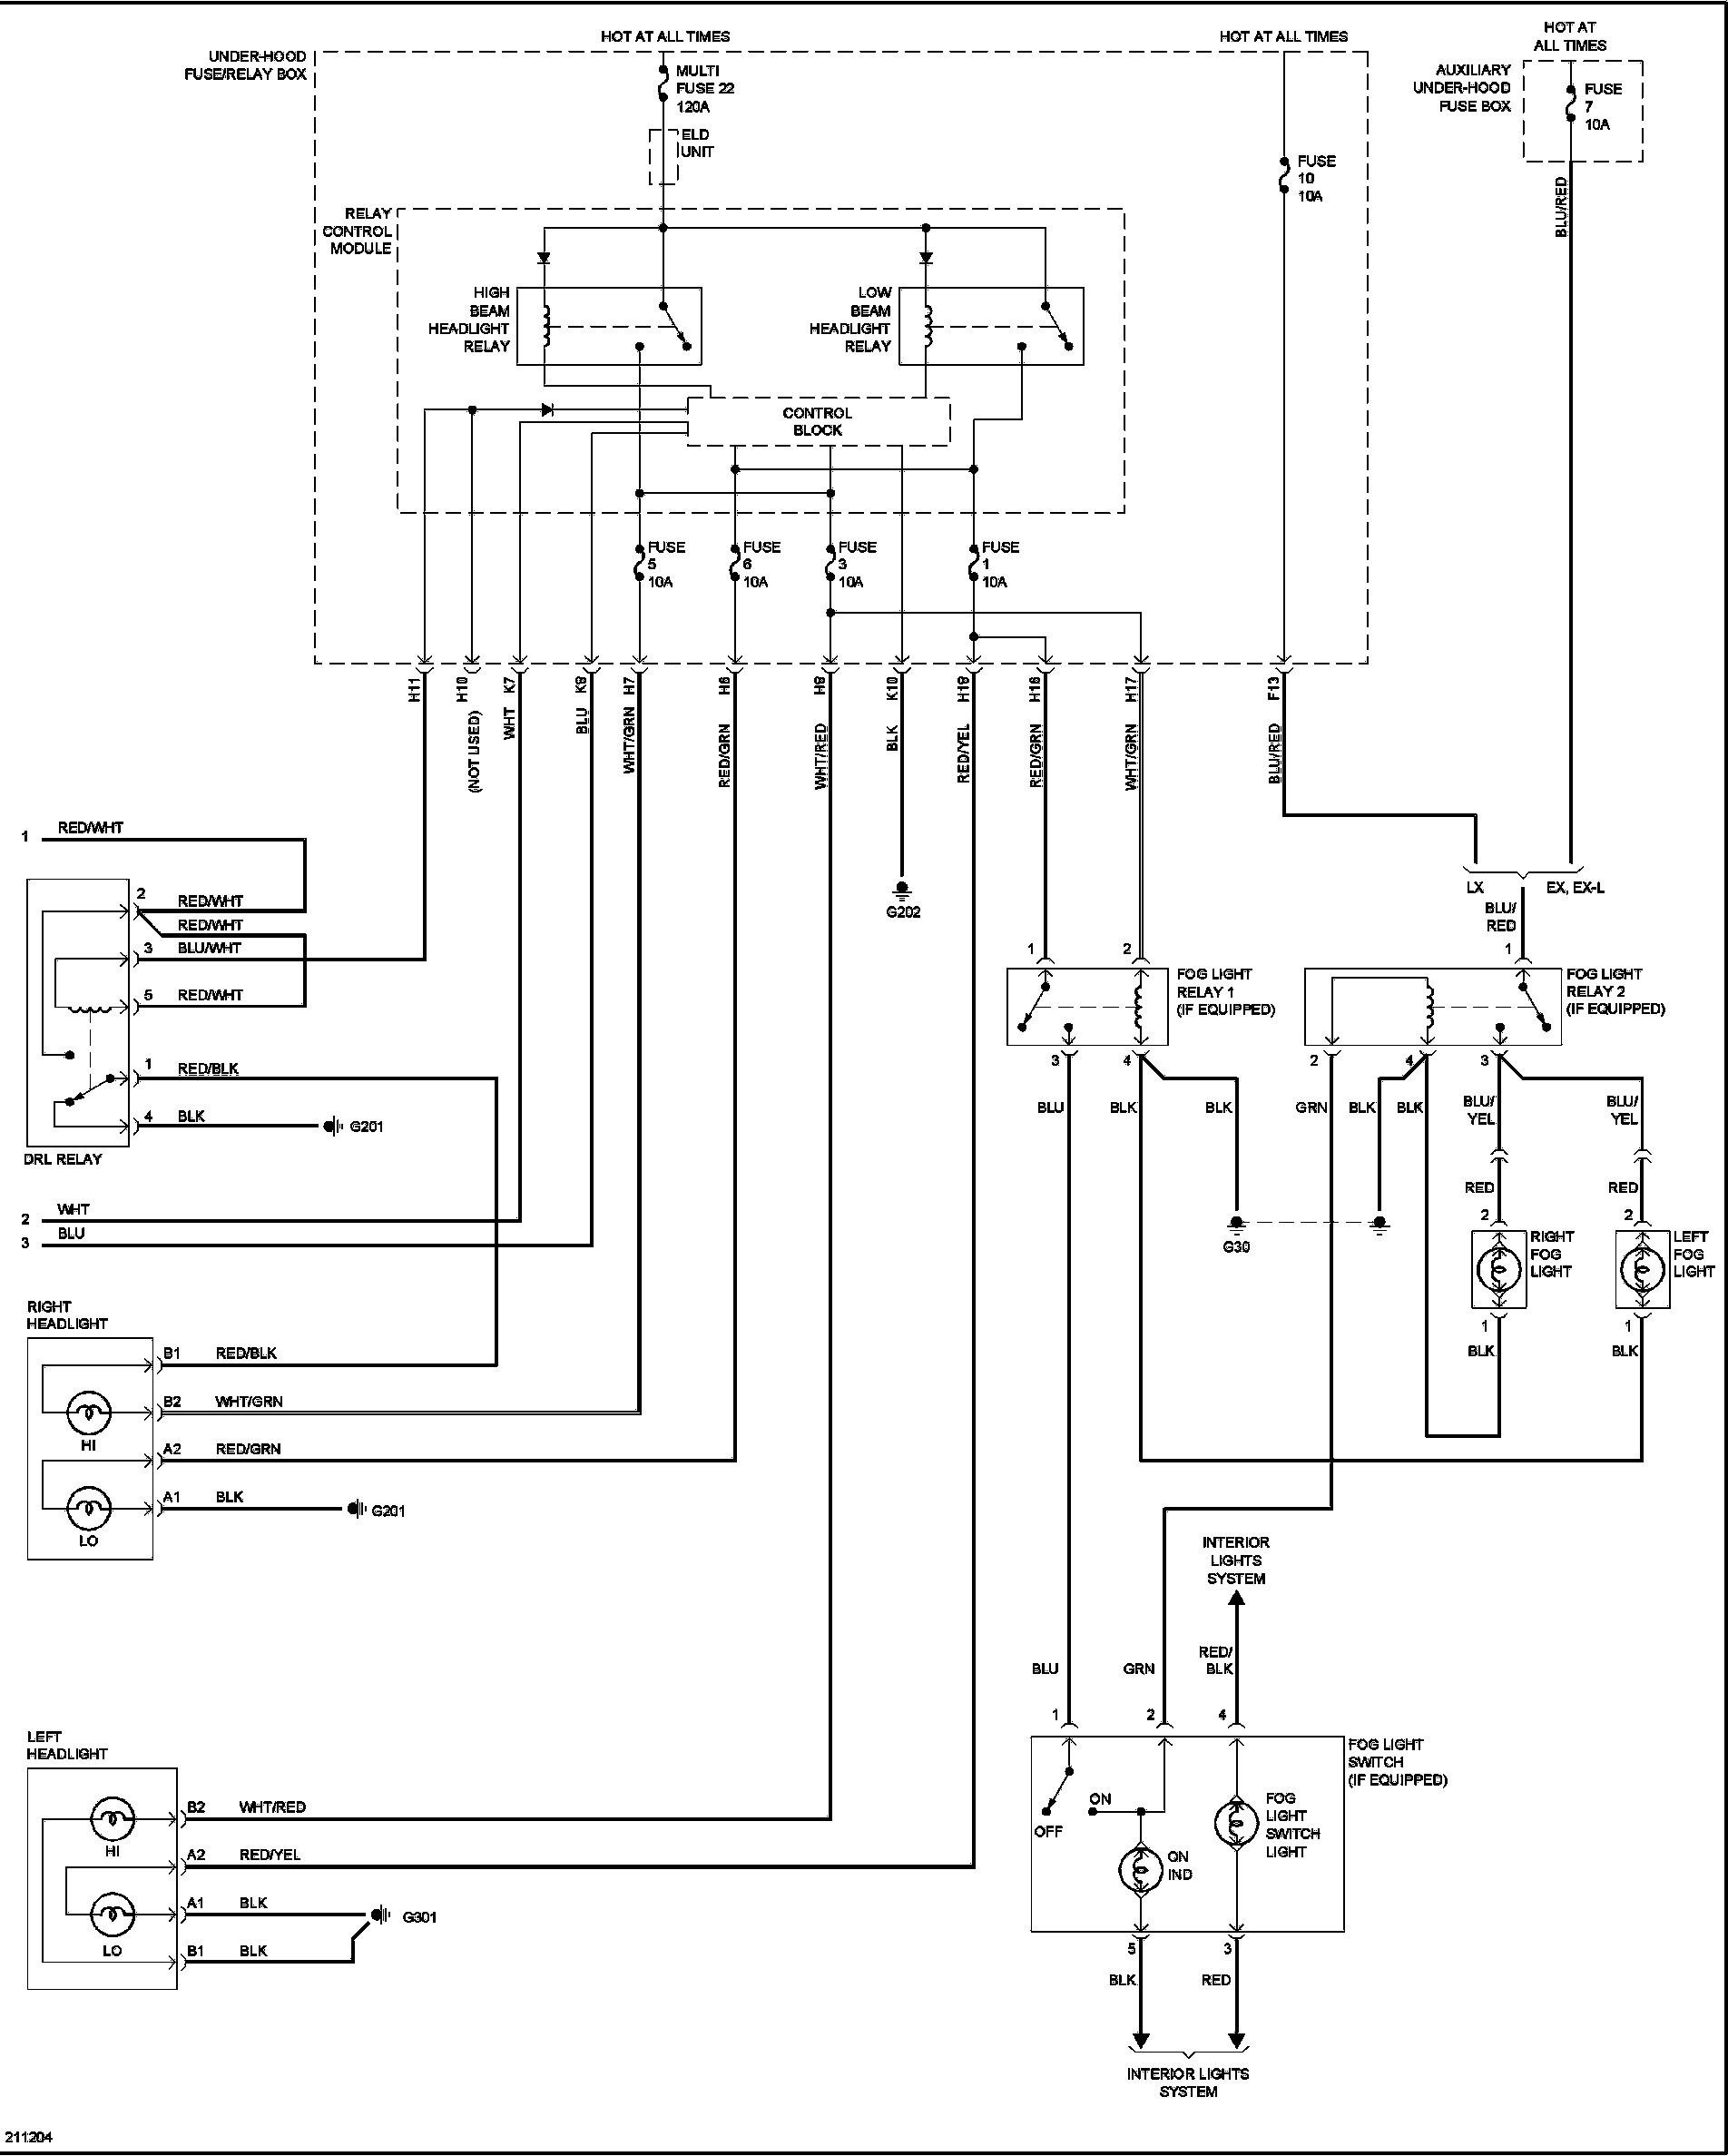 honda gl1000 goldwing wiring diagram gl1500 trailer wiring diagram 1985 Honda Goldwing Accessories